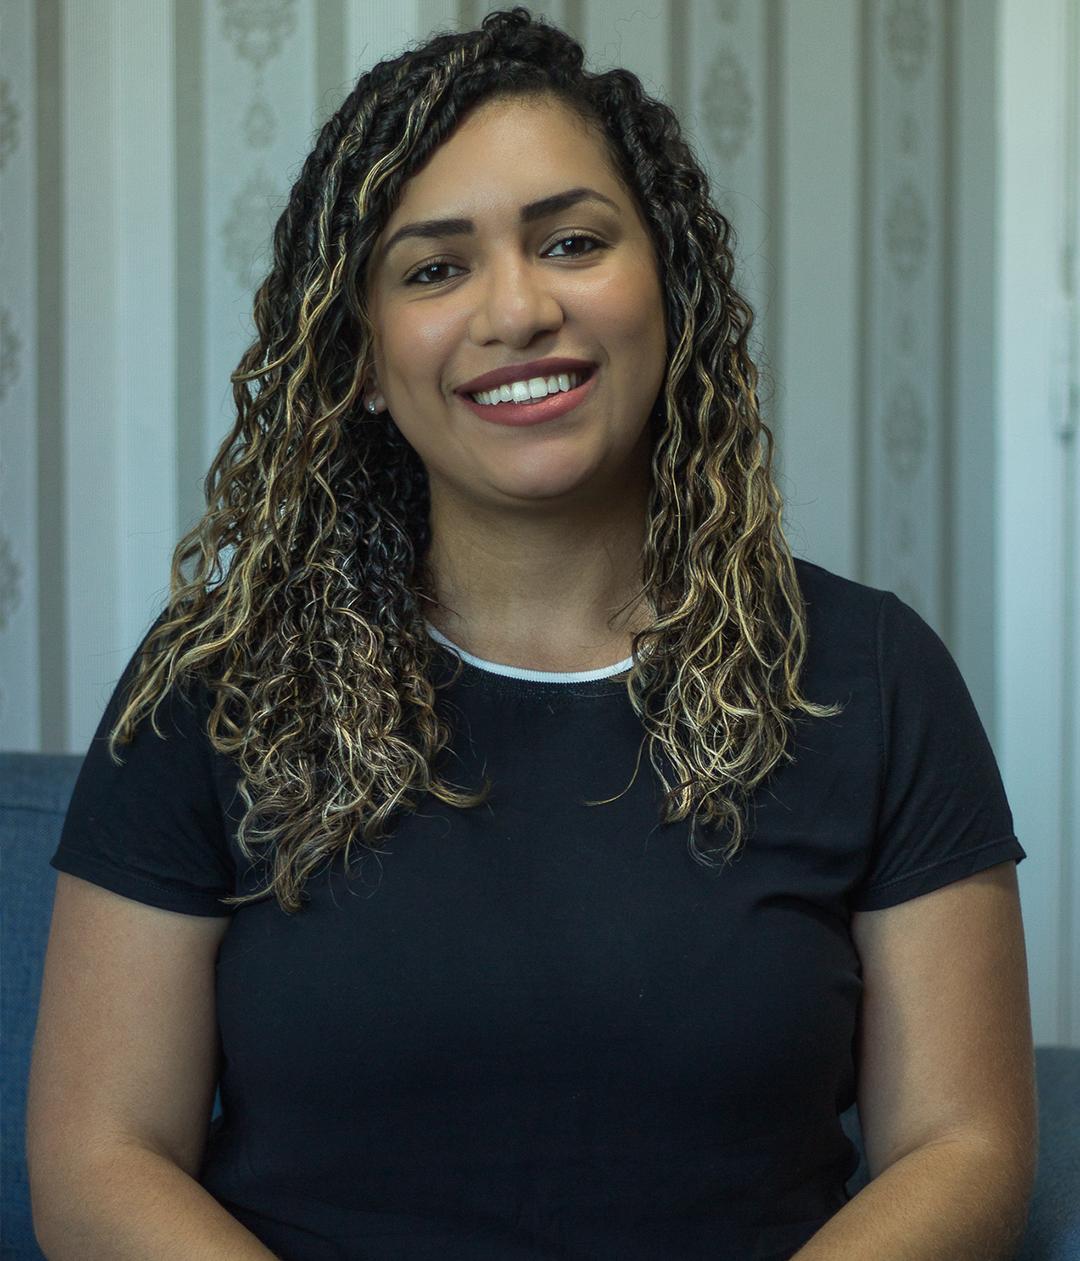 Jéssica Aparecida Costa da Silva, Psicóloga, CRP: 06/147632